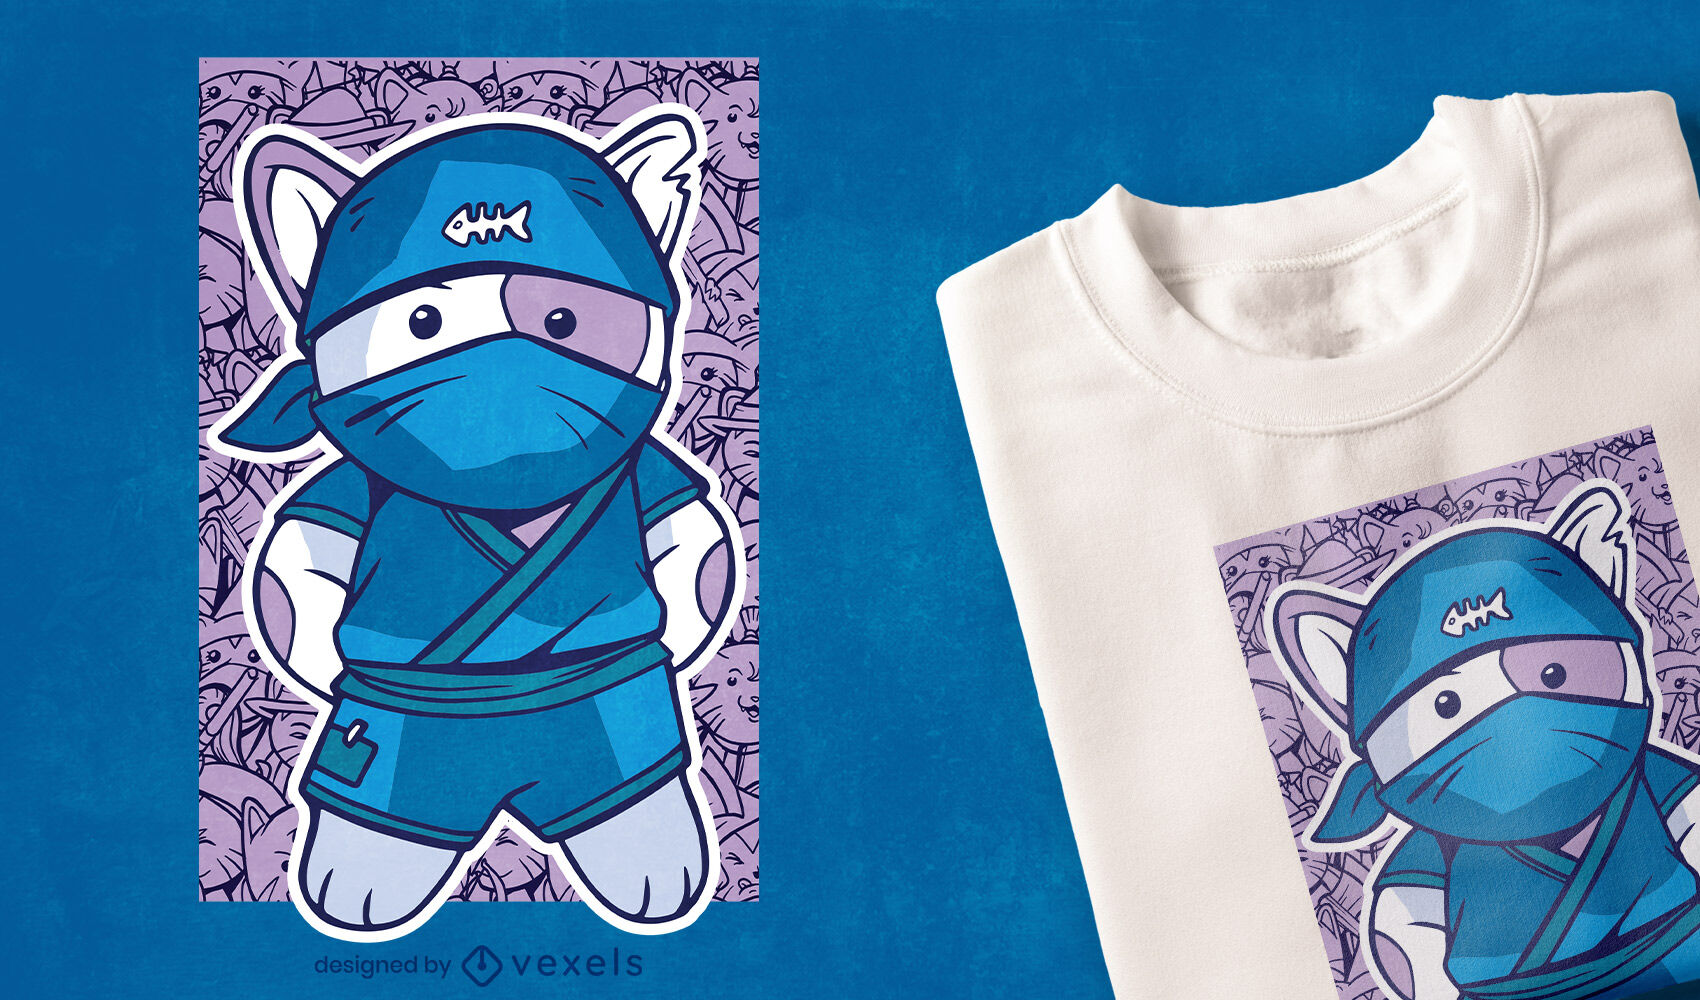 Ninja cat t-shirt design